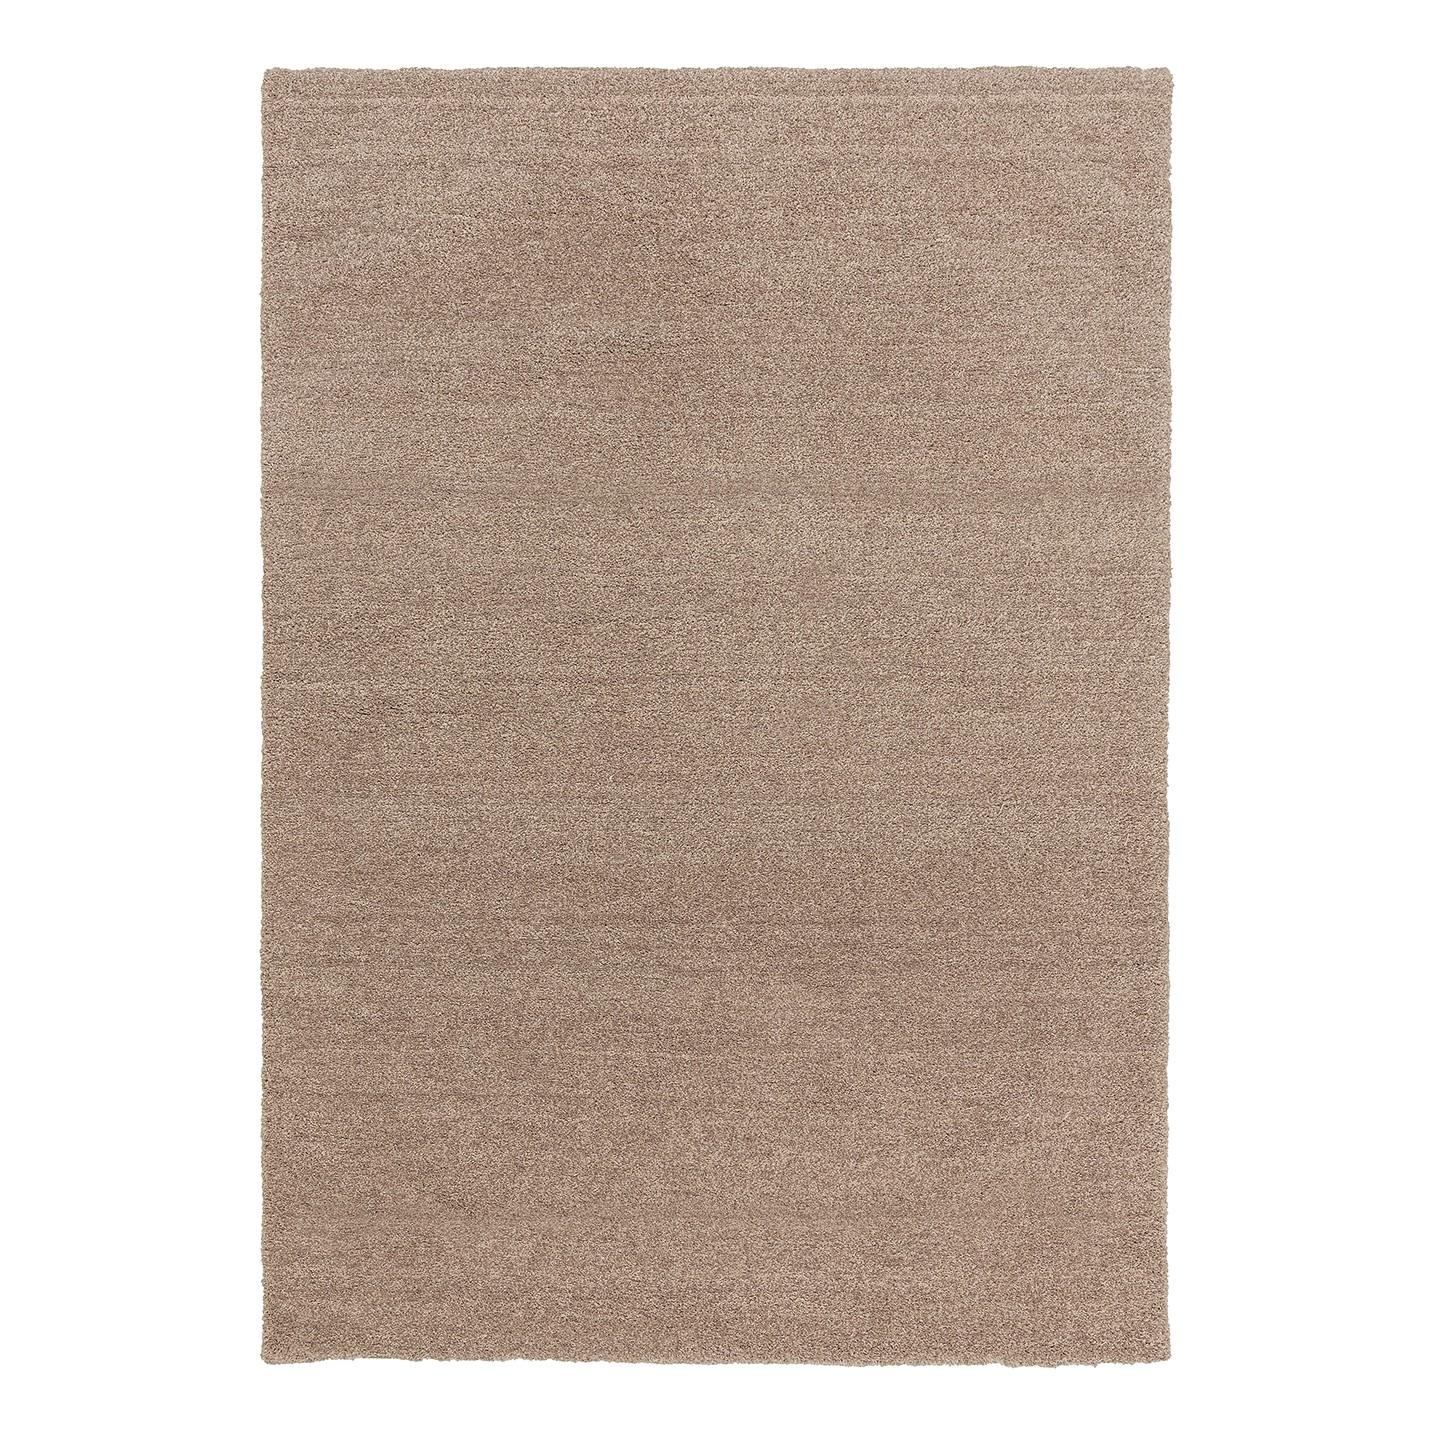 Teppich Livorno Melange - Kunstfaser - Warmes Beige - 140 x 200 cm, Astra